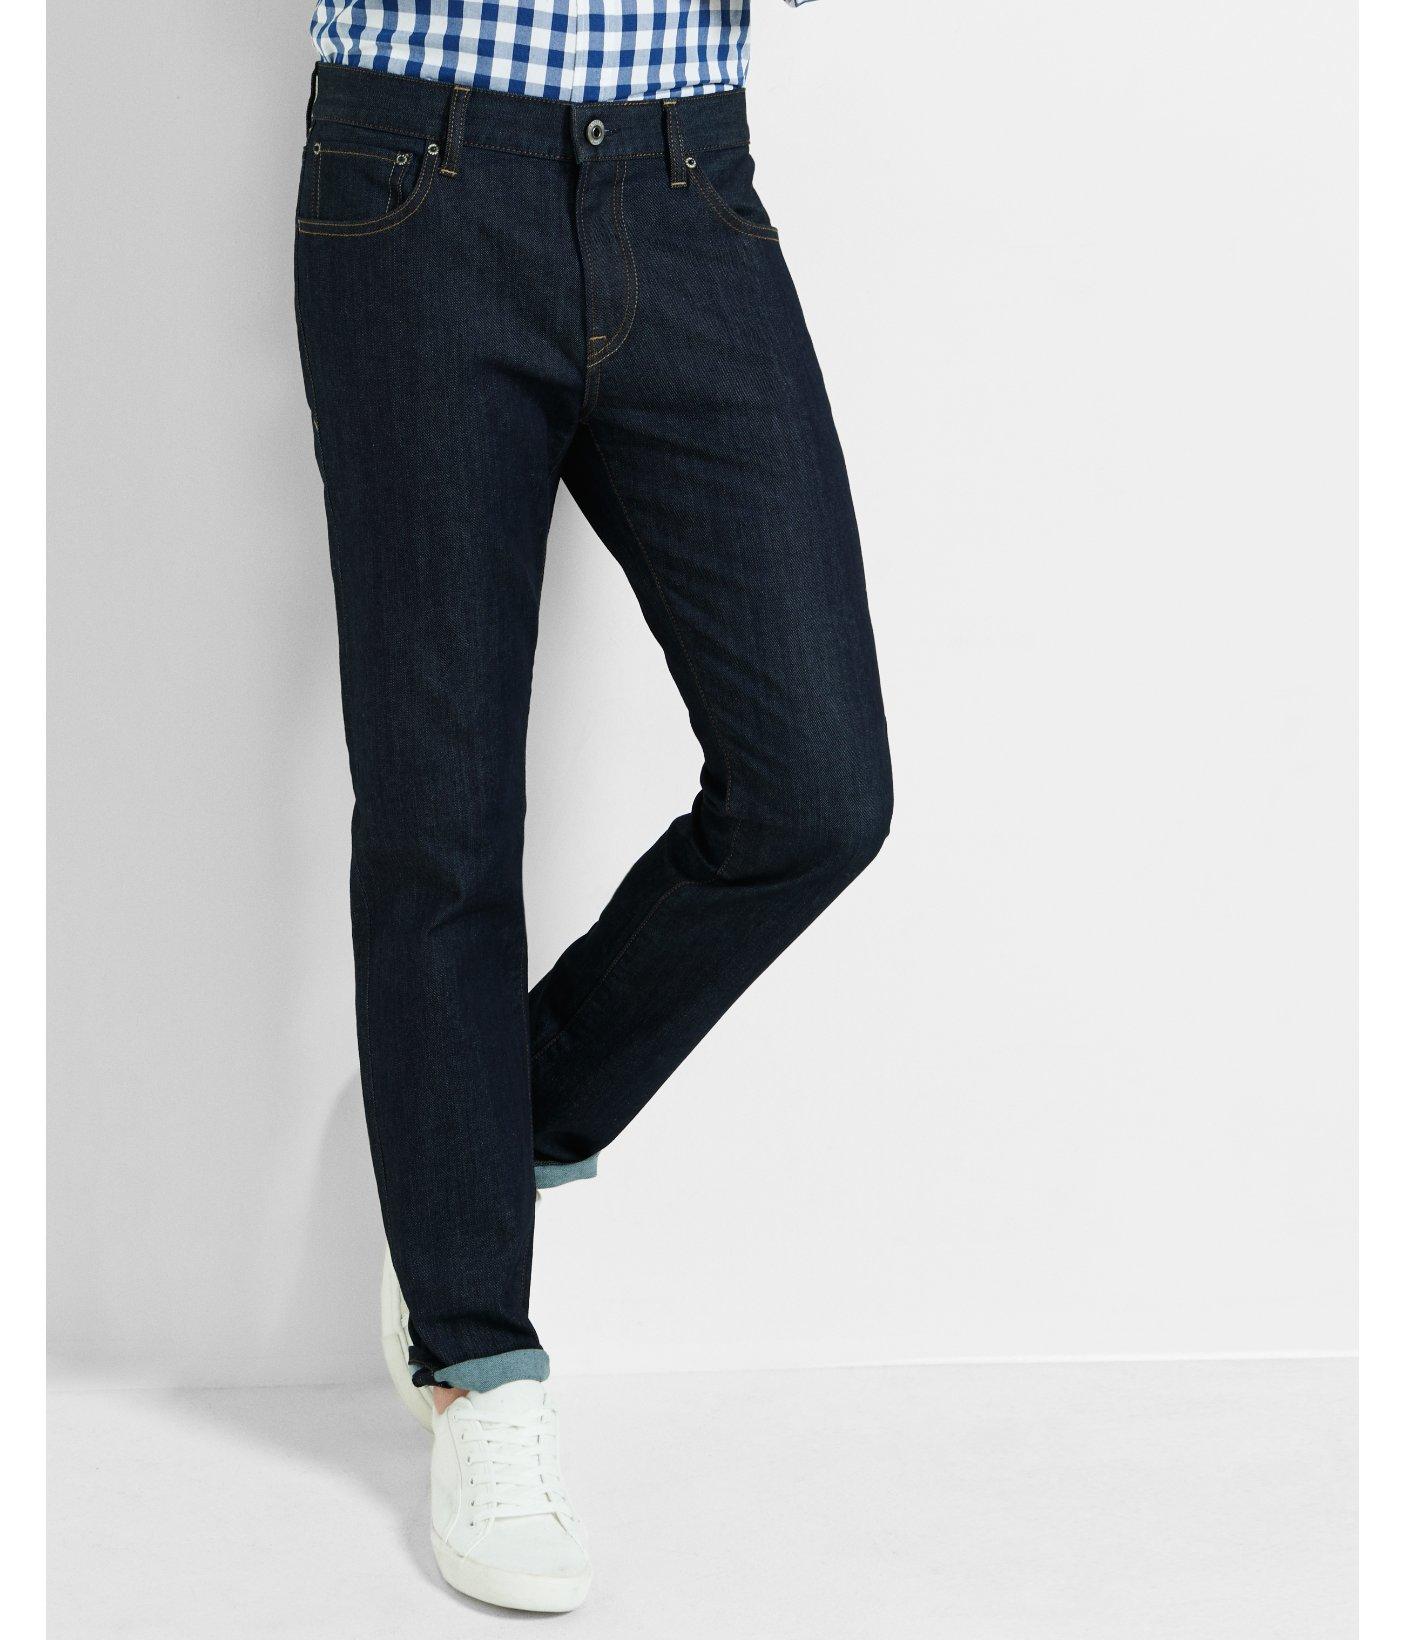 express slim fit rocco dark stretch slim leg jean in blue. Black Bedroom Furniture Sets. Home Design Ideas